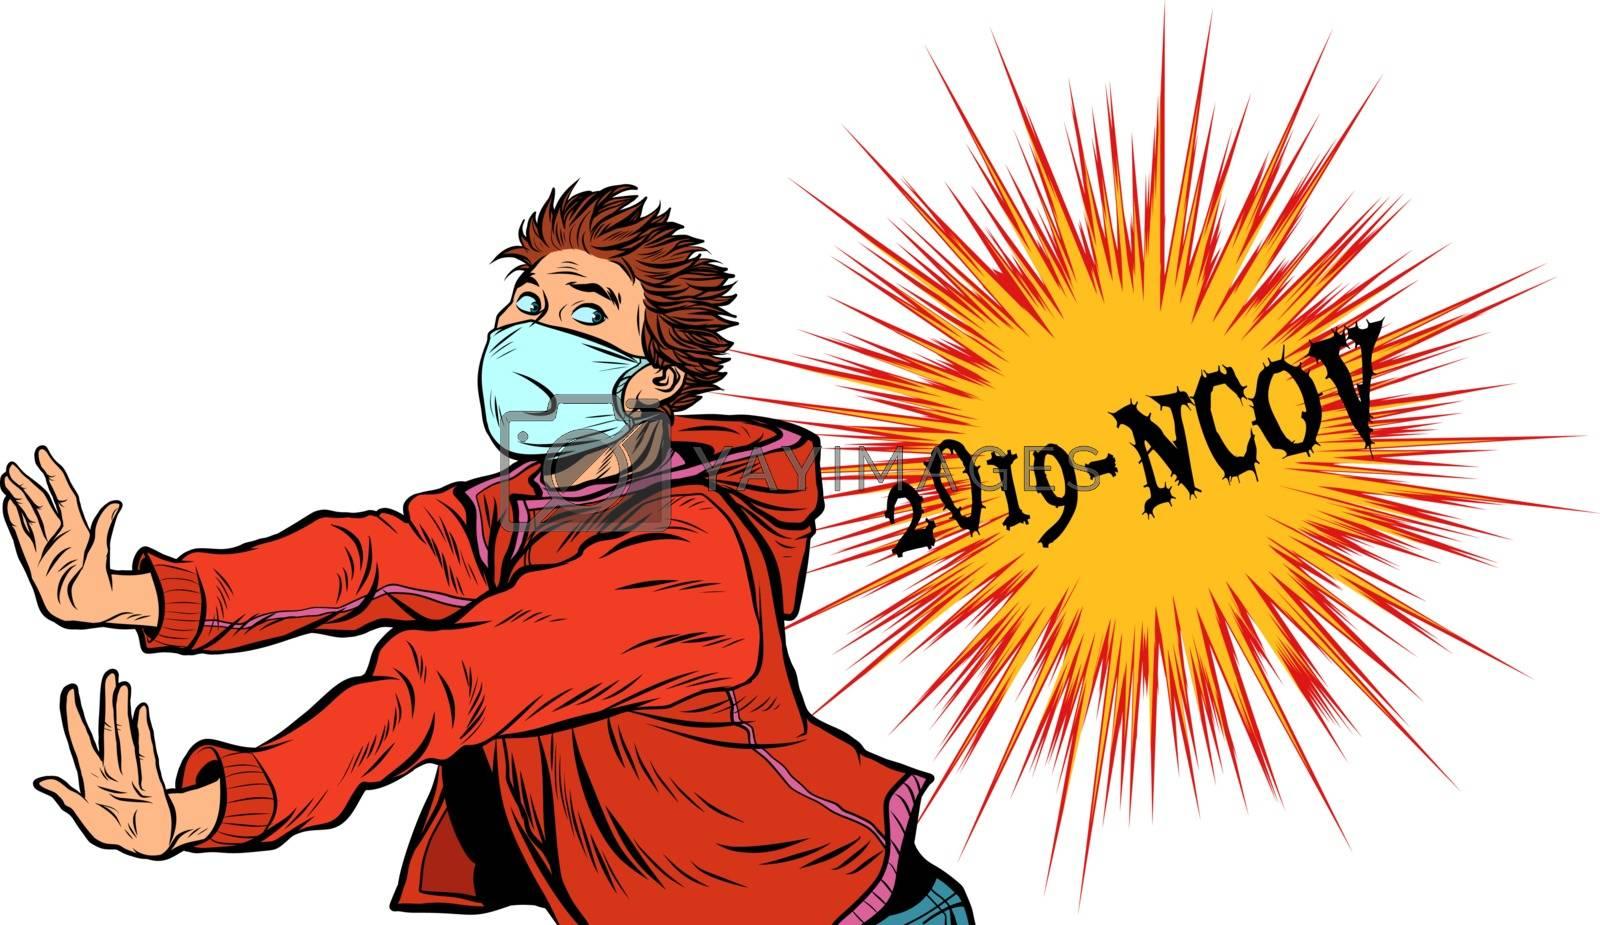 Panic, a person is afraid of an epidemic. Novel Wuhan coronavirus 2019-nCoV epidemic outbreak. Pop art retro vector illustration 50s 60s style